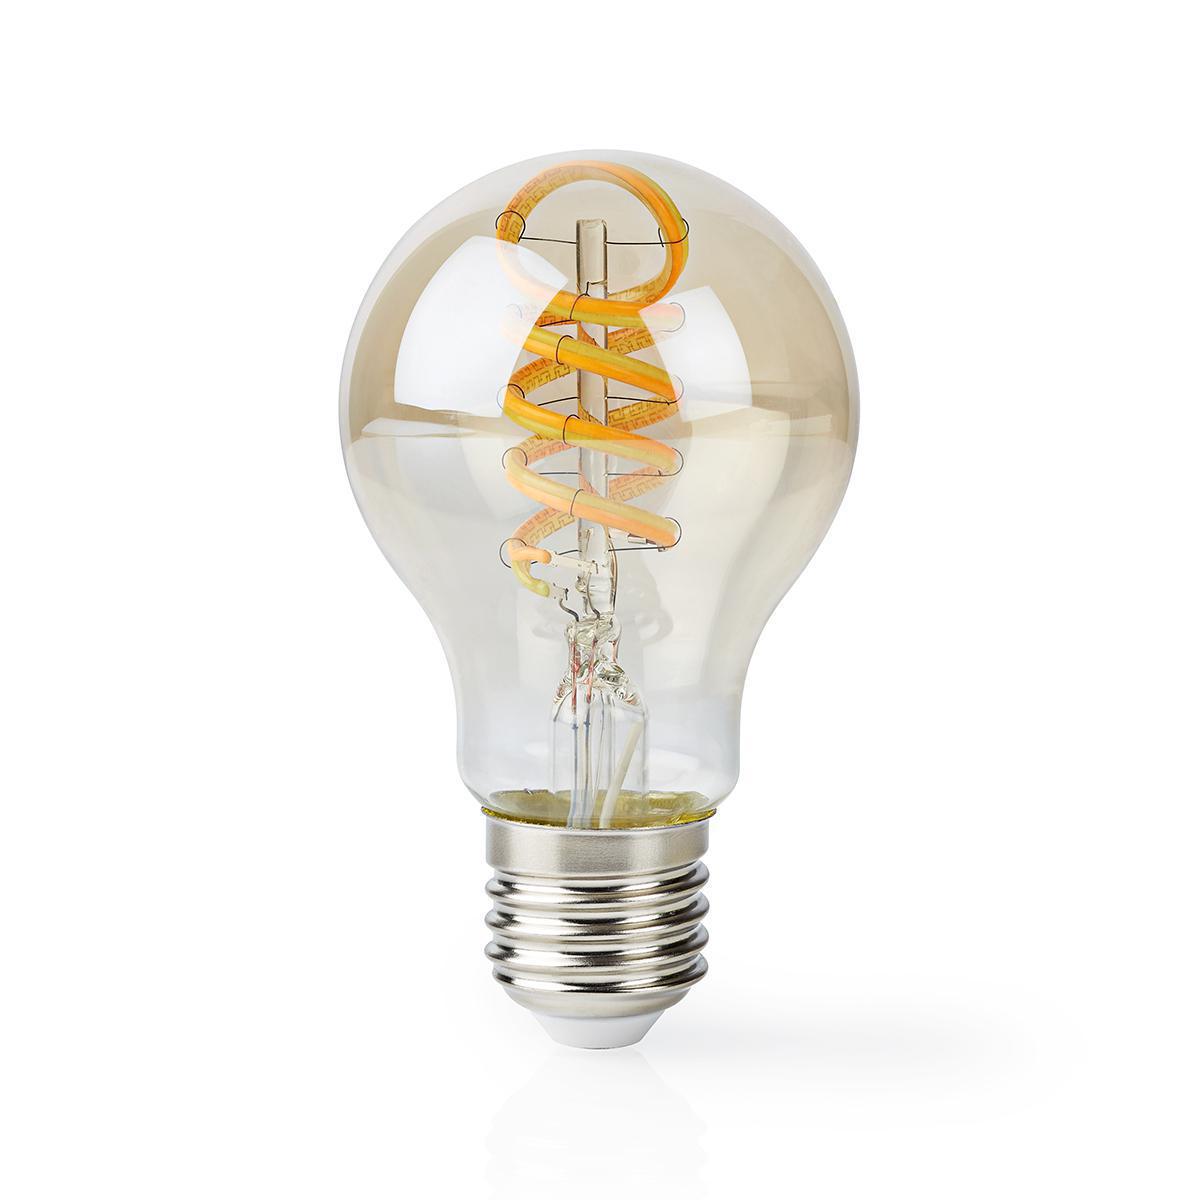 Slimme WiFi LED lamp - in kleur verstelbaar - 1800K warm wit - 6500K daglicht E27 spiraal lamp - dimbaar - app besturing - 5,5W - voorkant